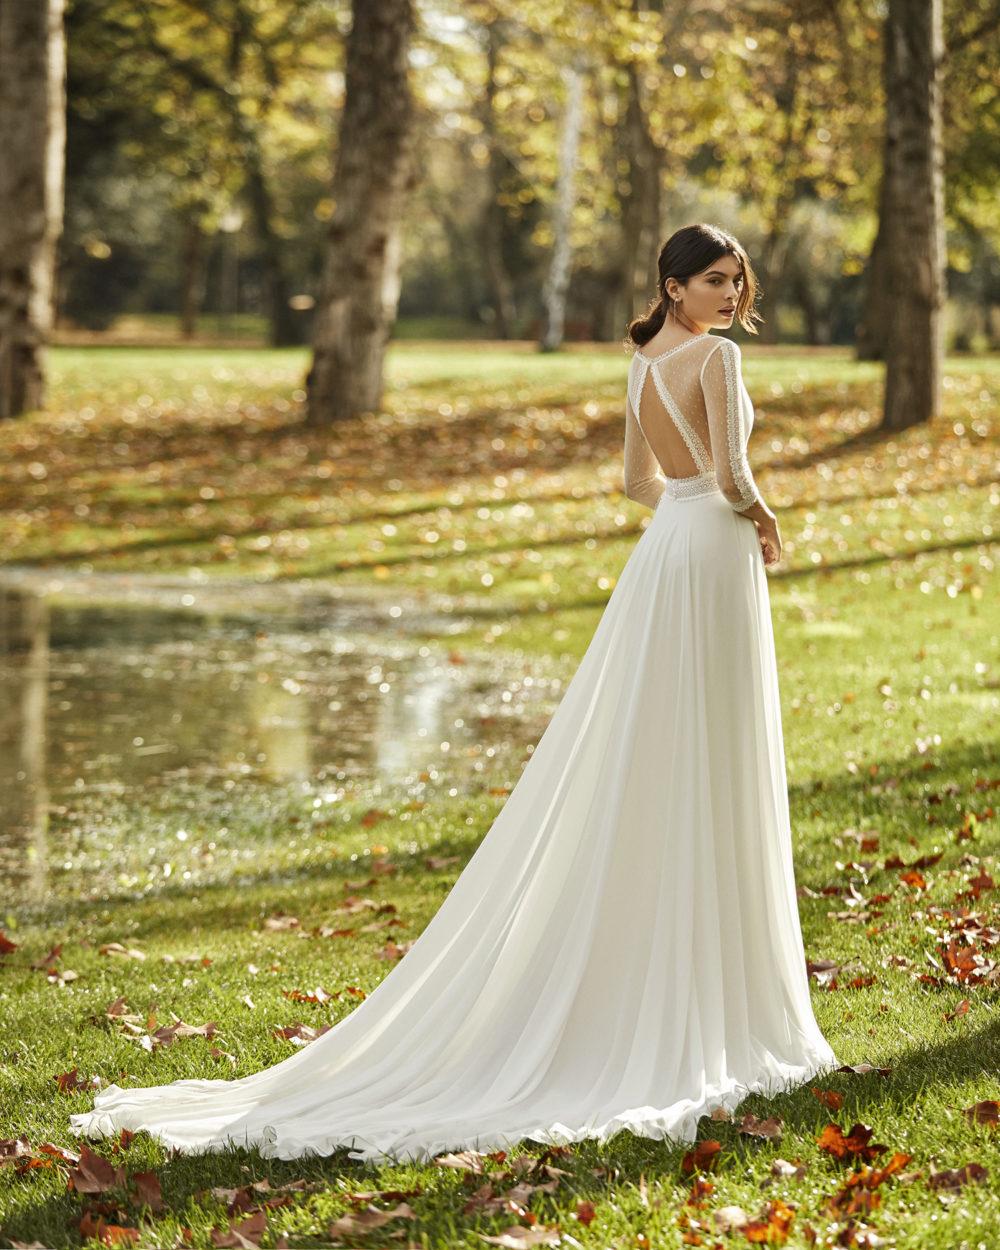 Mariages: abito da sposa Rosa Clarà 2020 a Vicenza, Verona, Padova, Veneto 4B108 OBRA